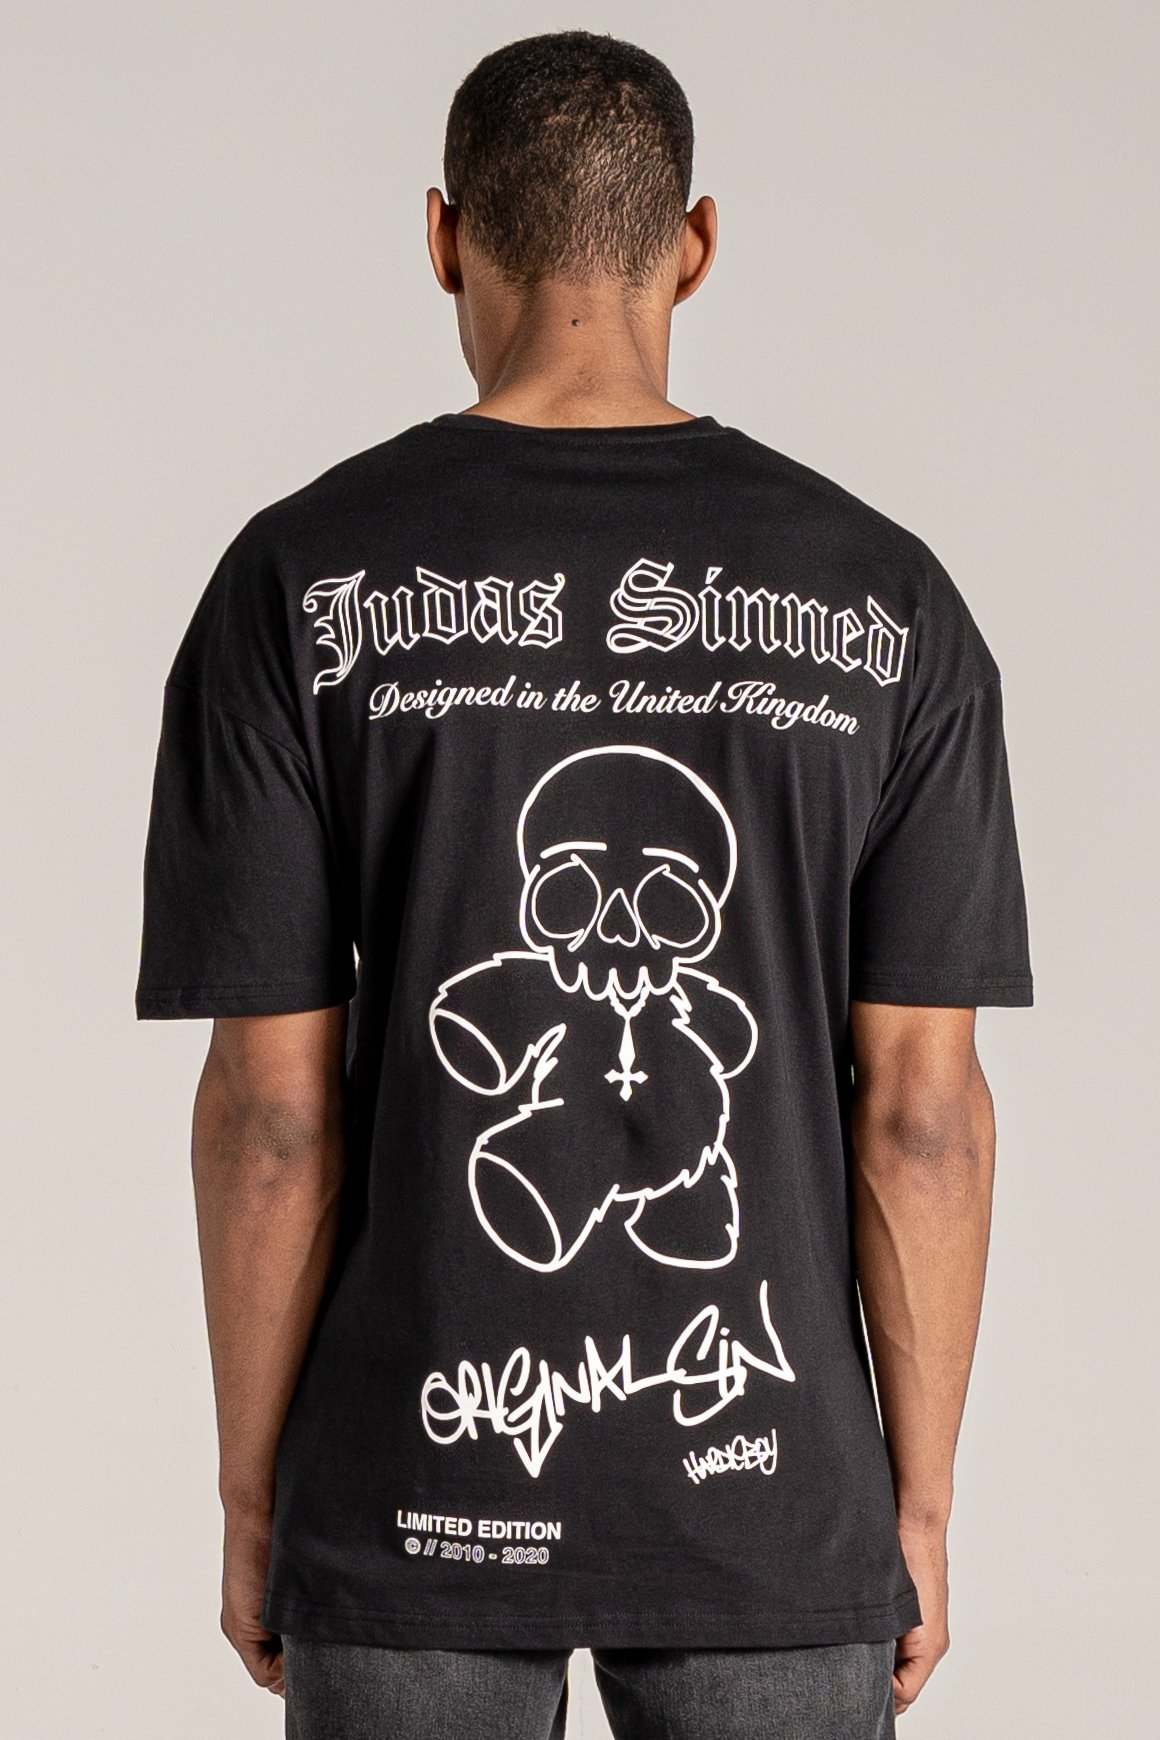 Limited Original Sin Bear Print Men's T-Shirt - Black, Small